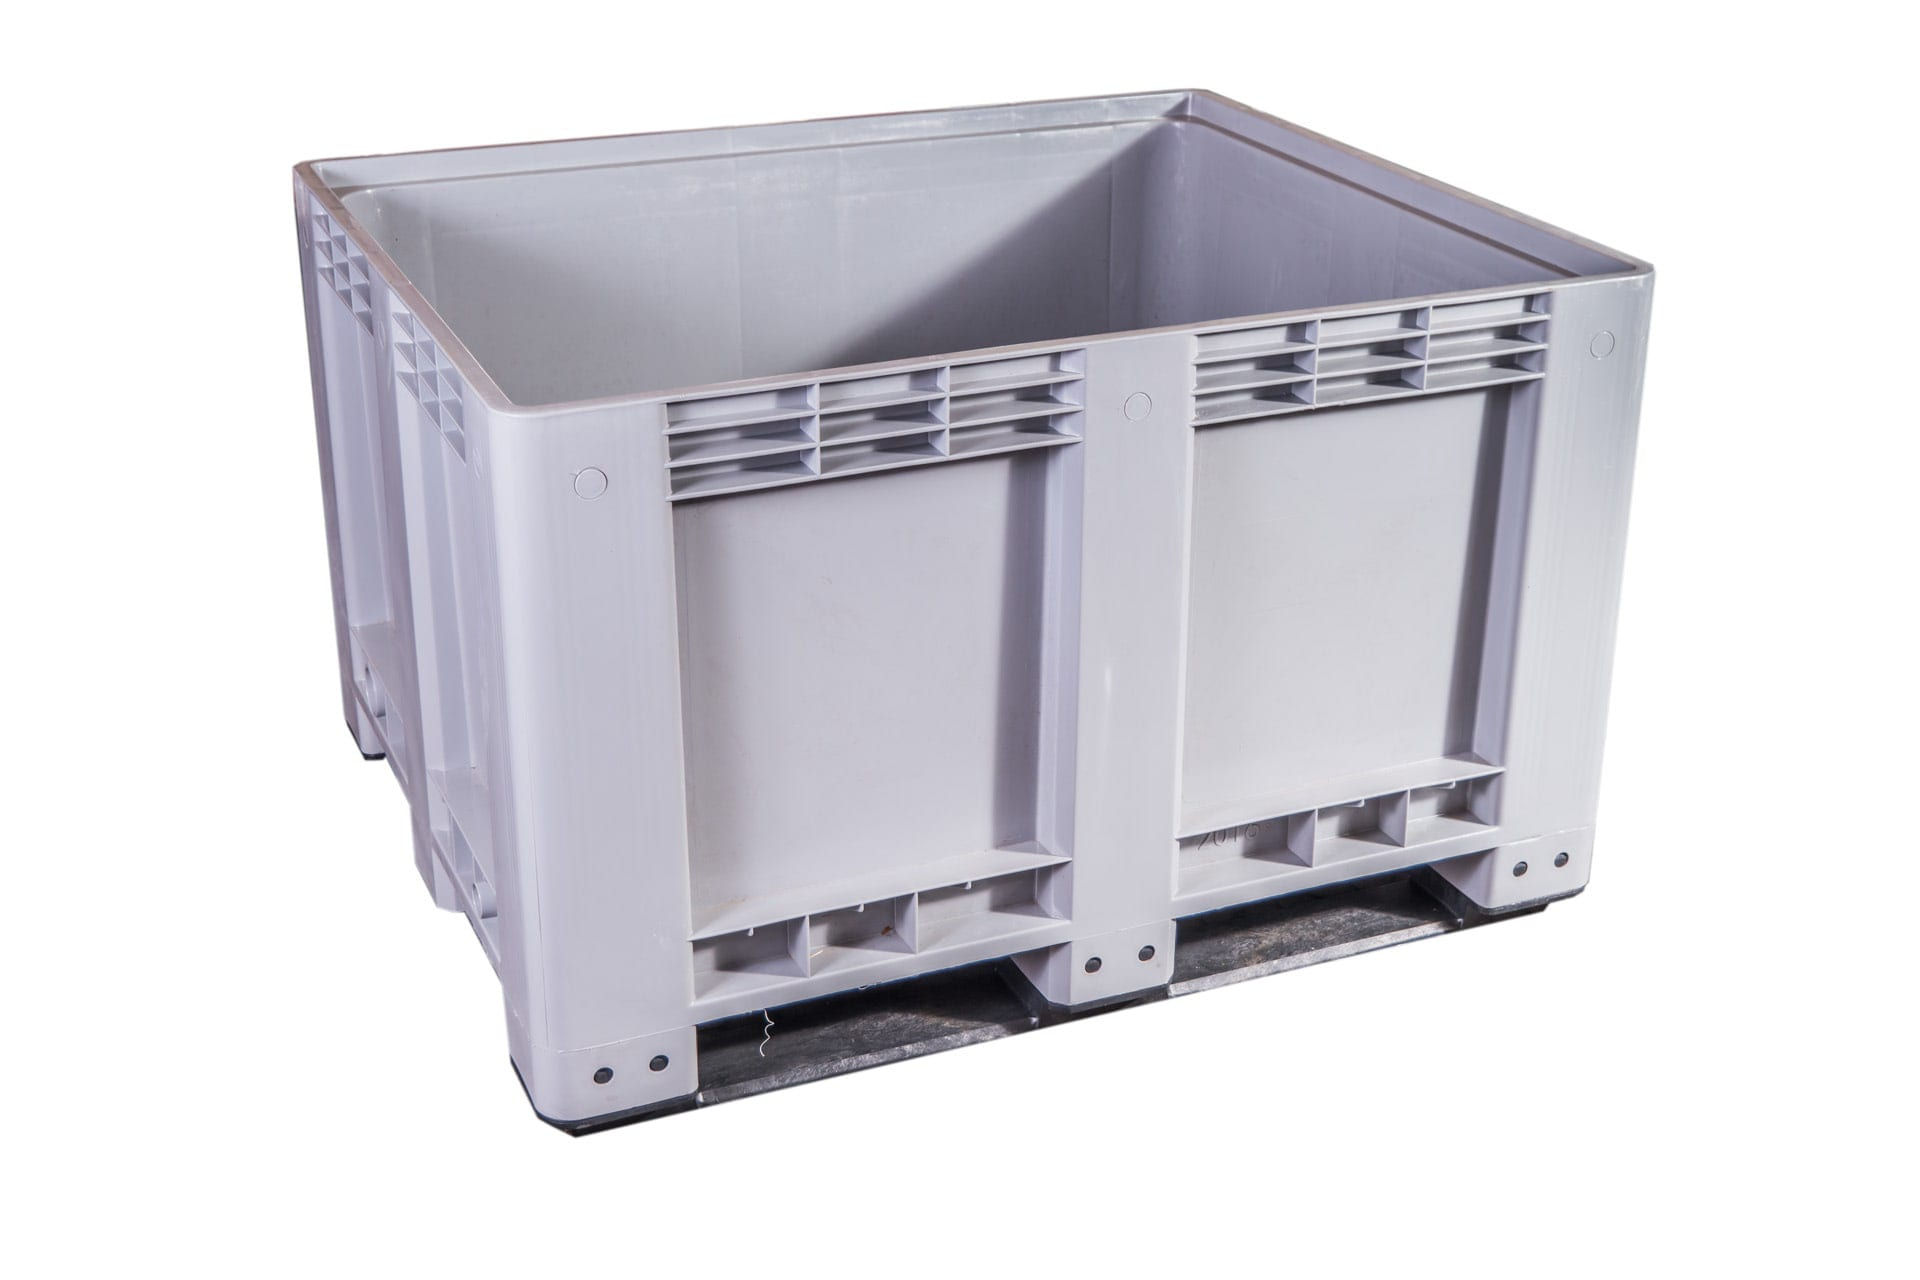 boxpalet bigbox 1200×1000 cu peretii plini